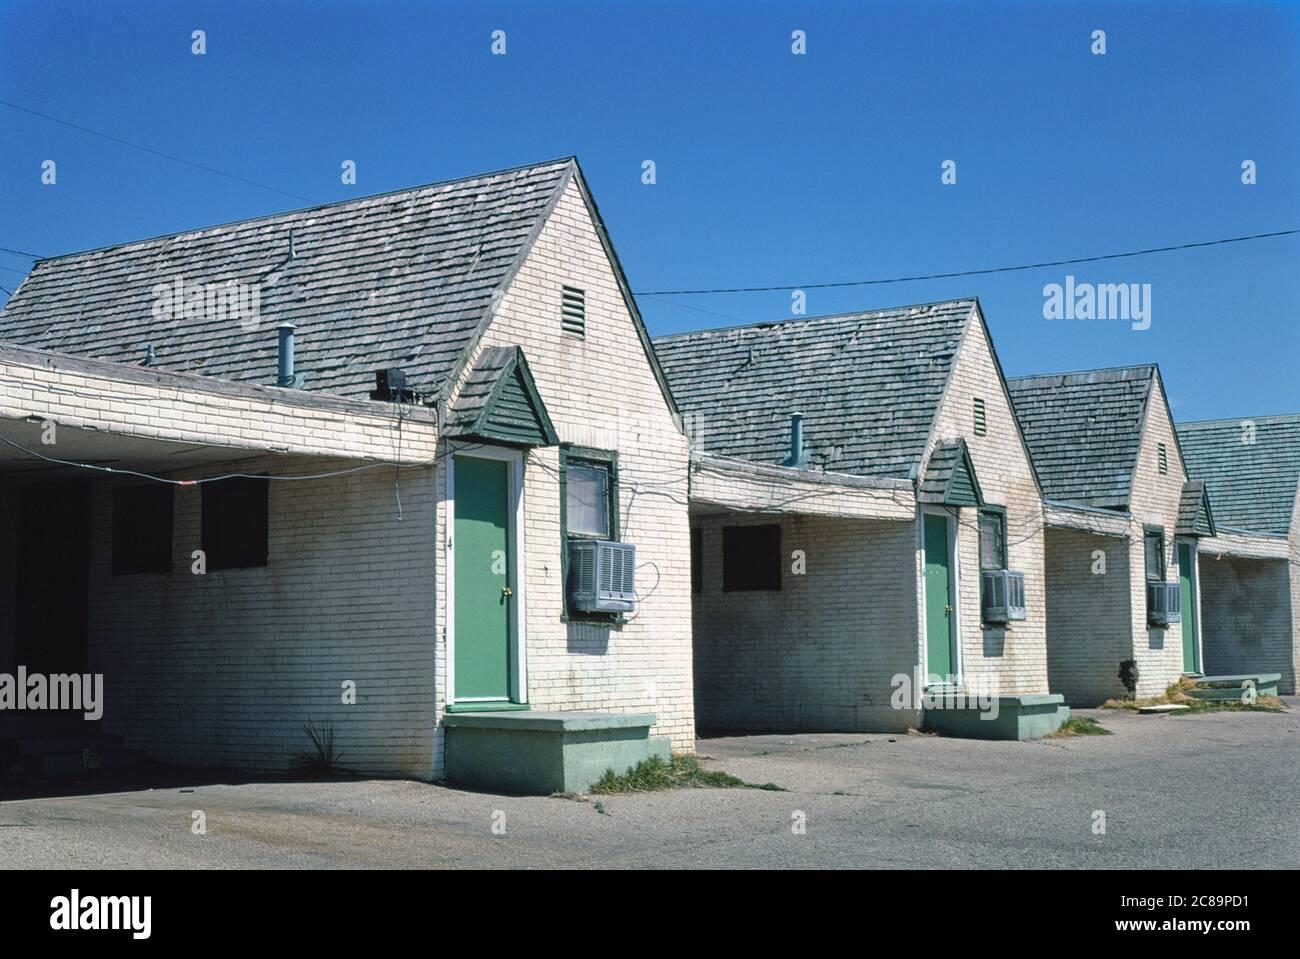 Green Gables Motel, Amarillo, Texas, USA, John Margolies Roadside America Photograph Archive, 1977 Stock Photo